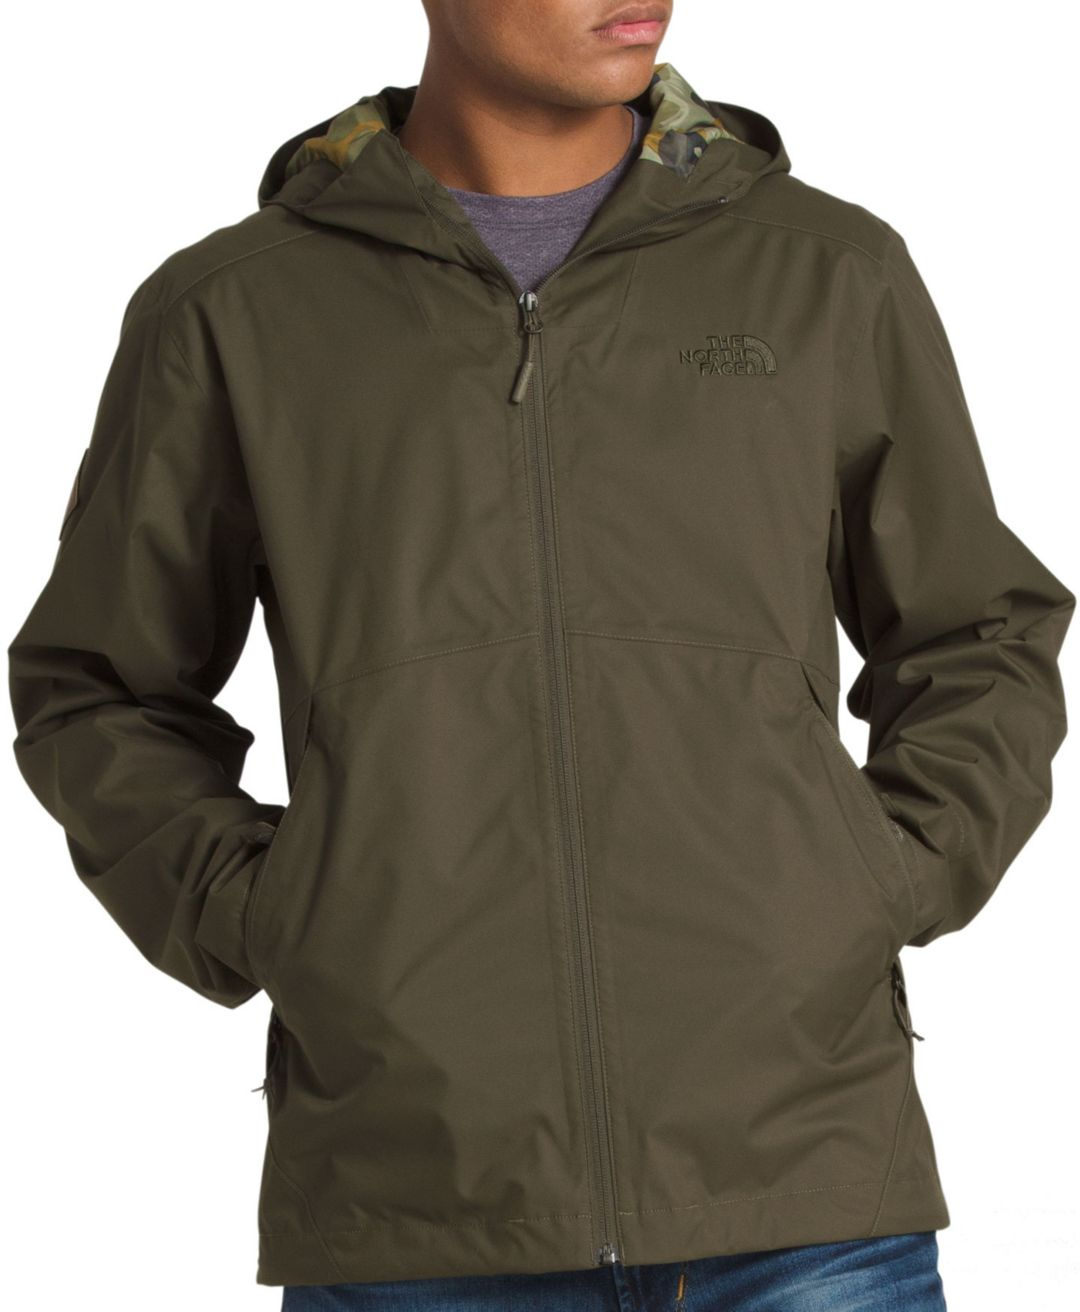 0dc57bac3c405 The North Face Men's Millerton Rain Jacket | DICK'S Sporting Goods